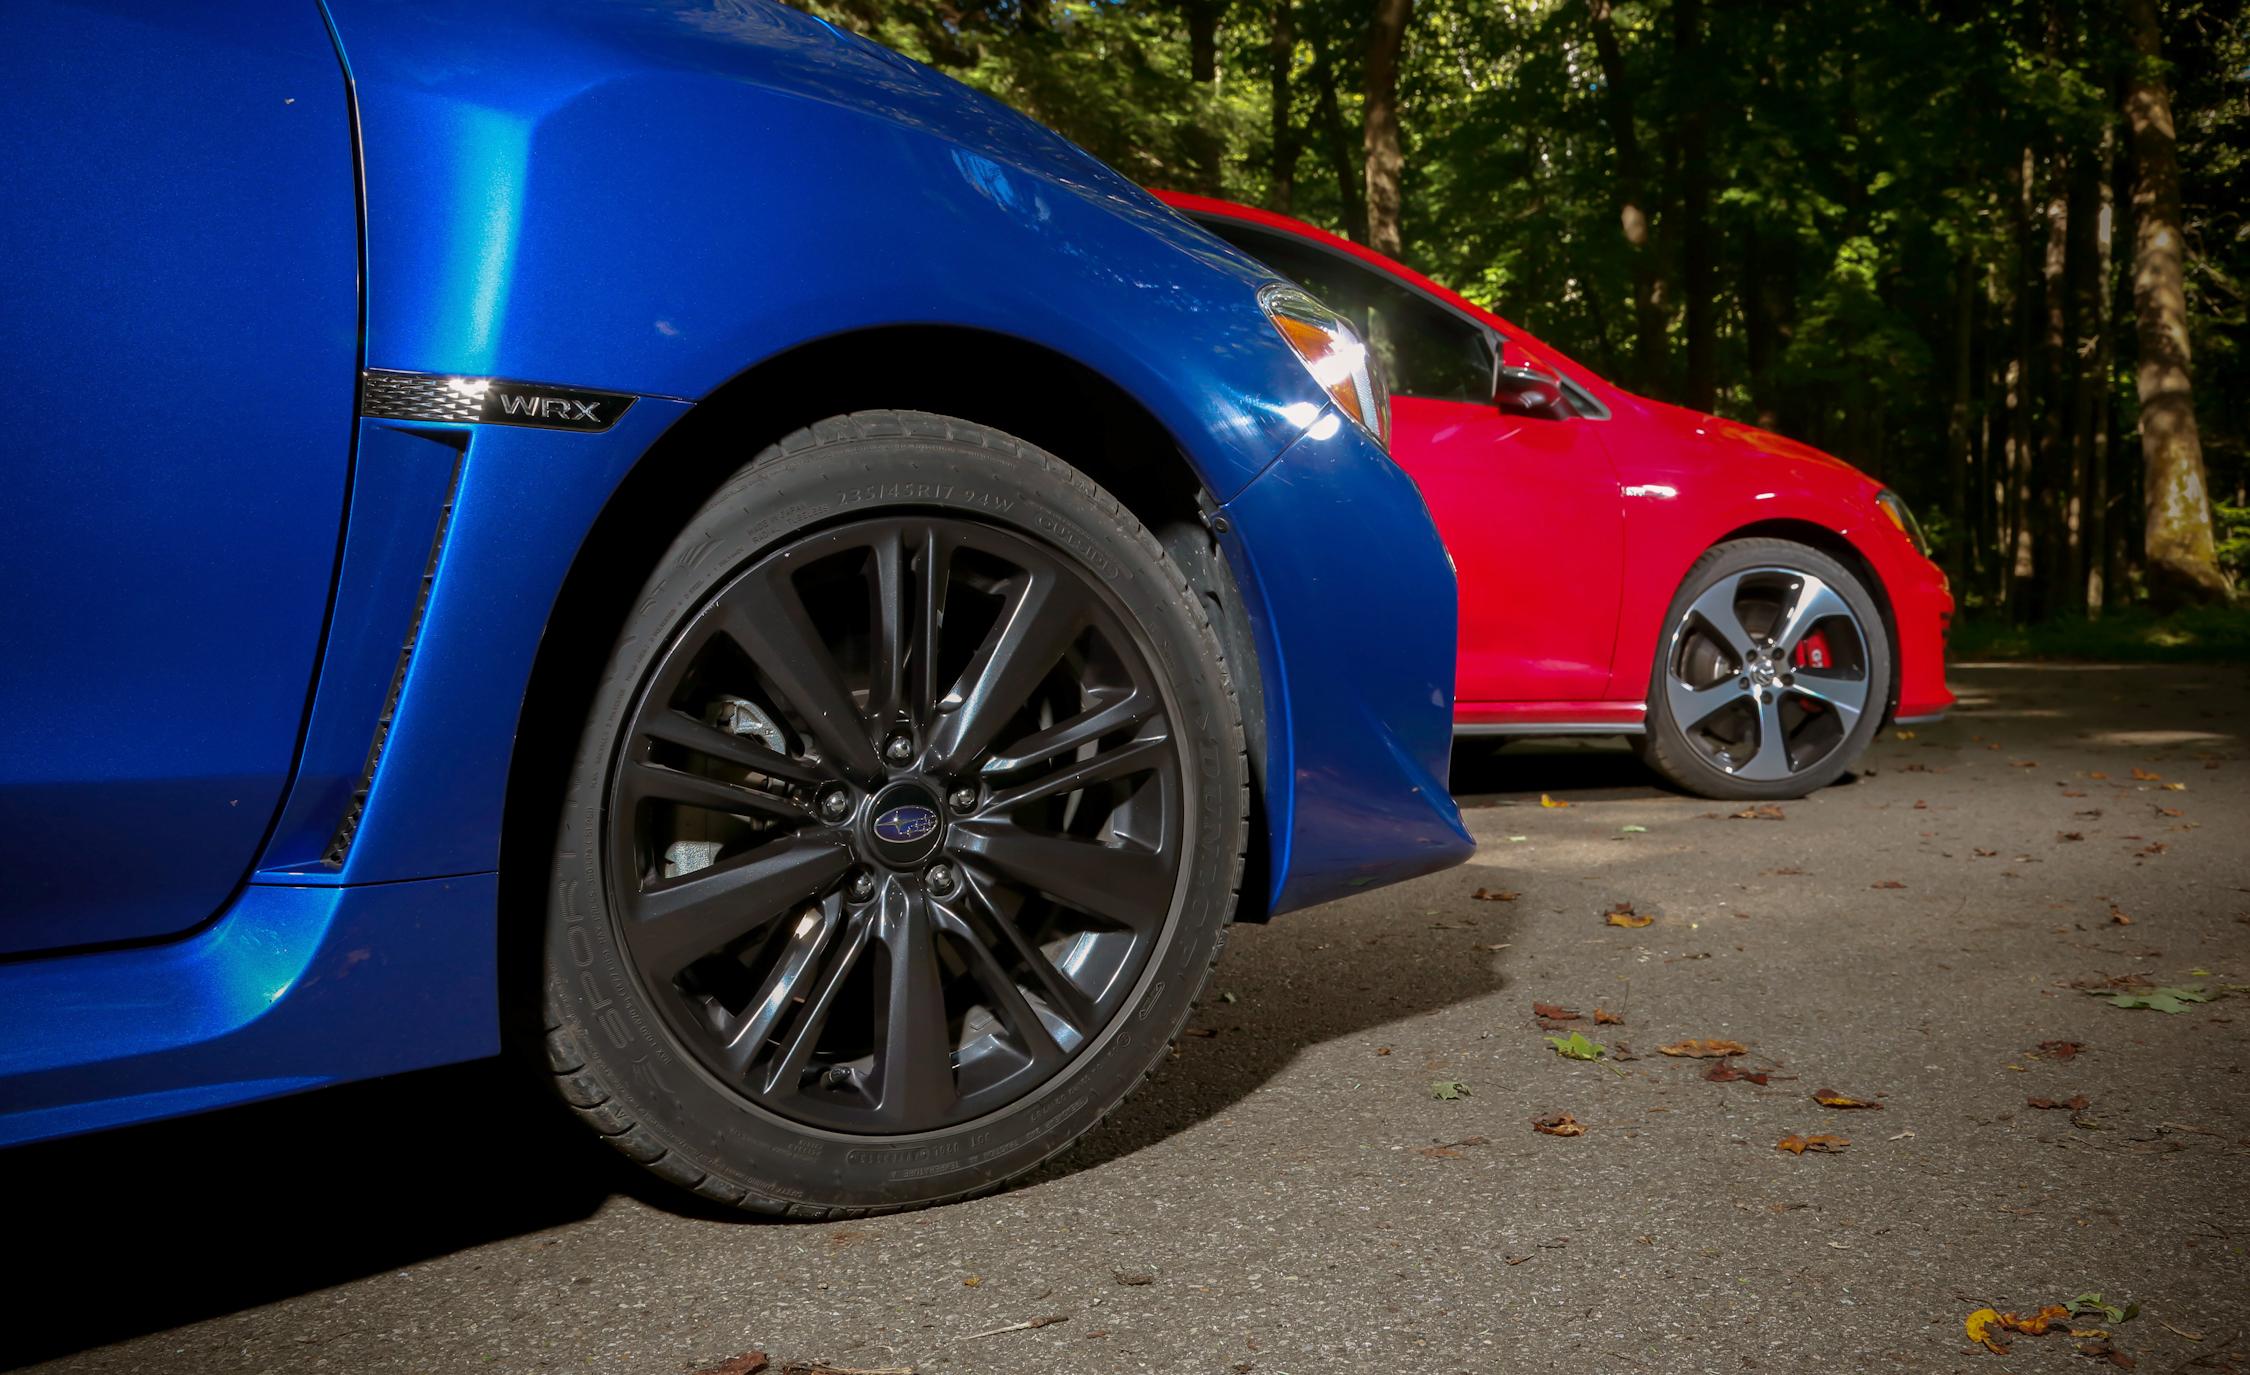 2015 Subaru WRX vs Volkswagen GTI Wheel Trim Comparison